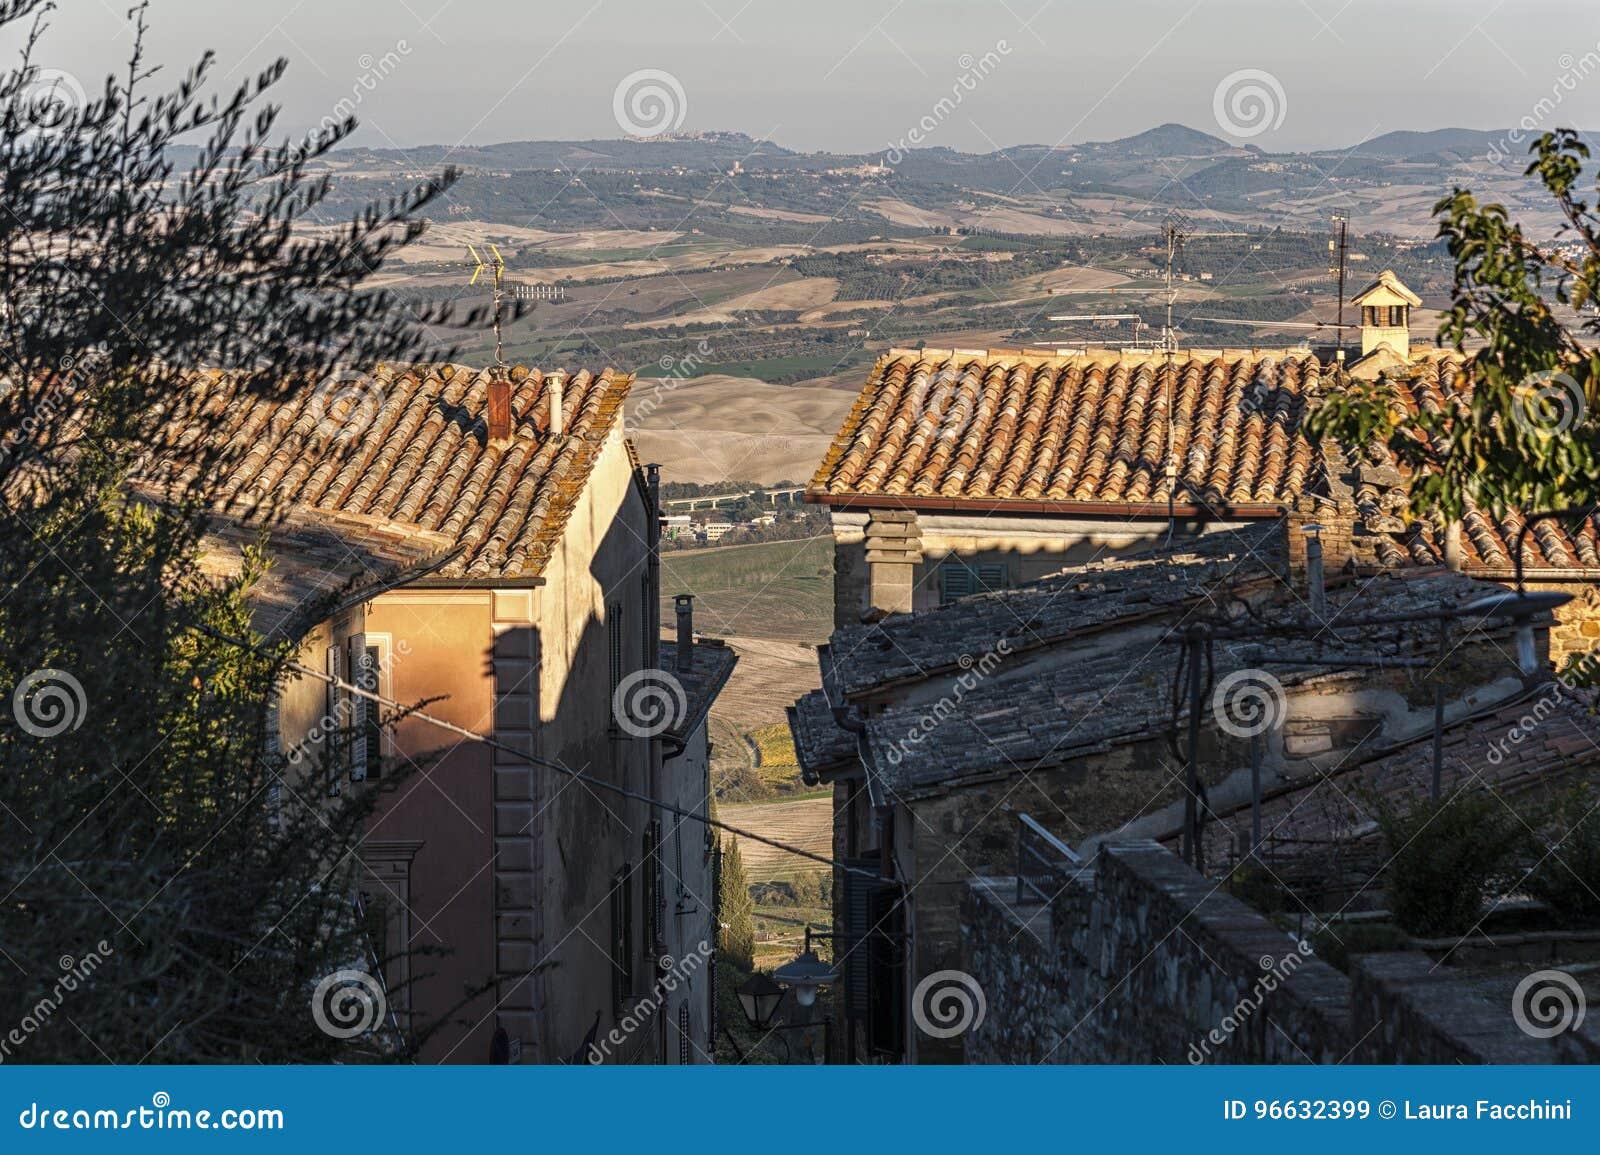 MONTALCINO, TUSCANY/ITALY: 31 OKTOBER, 2016: Smalle straat in historisch centrum van Montalcino-stad, Val D ` Orcia, Toscanië, It